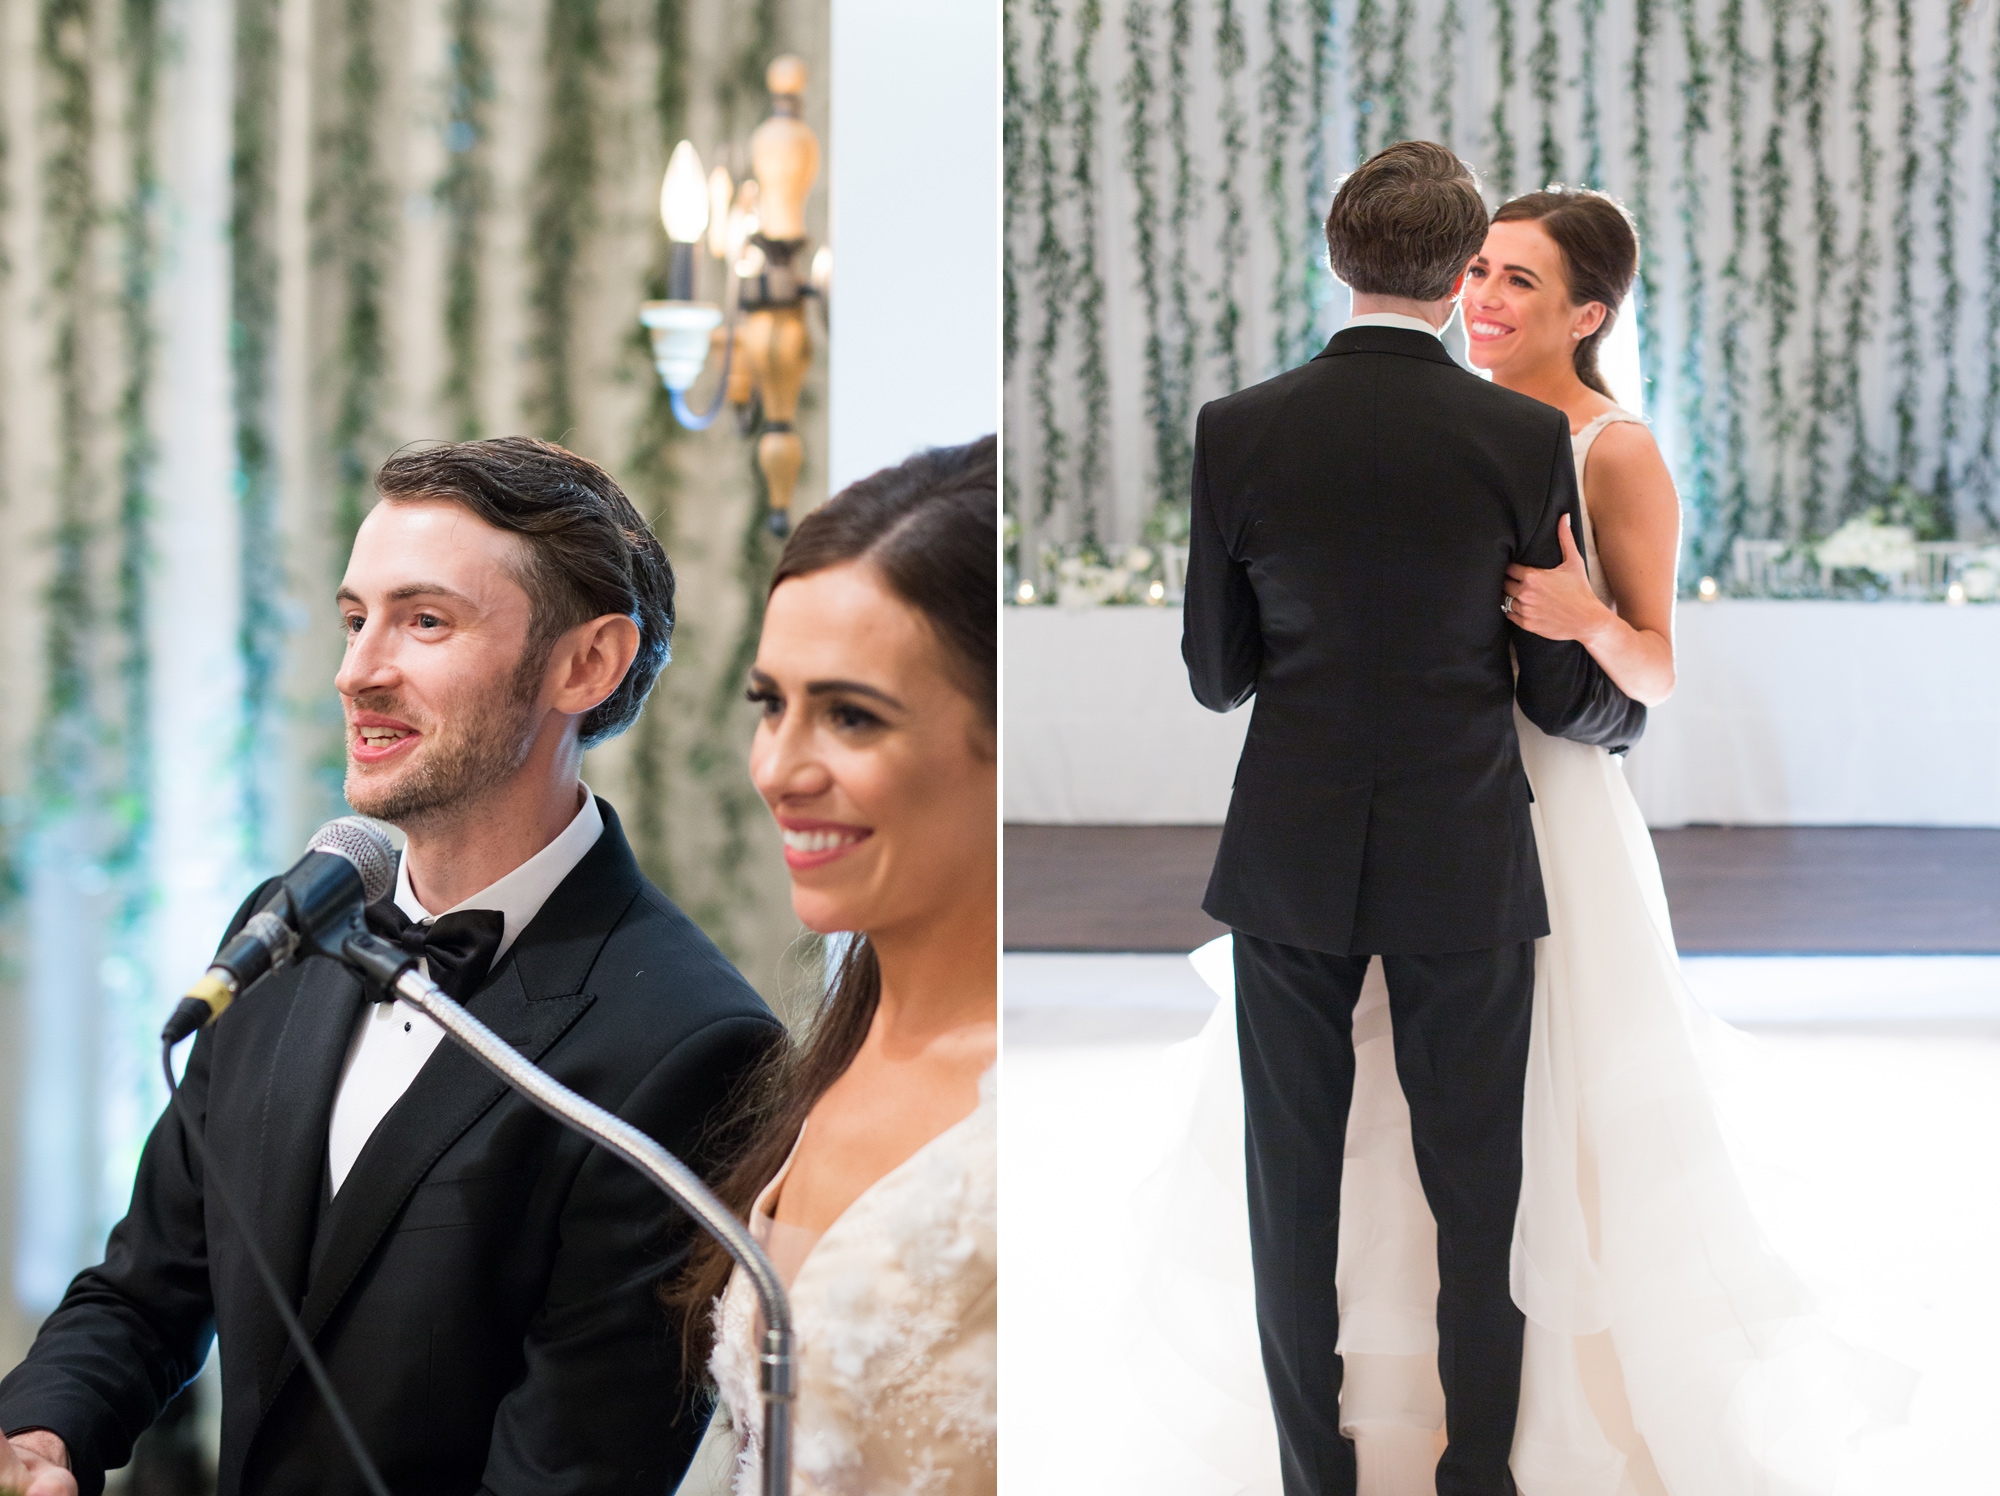 516-keltic-lodge-wedding-----------.jpg